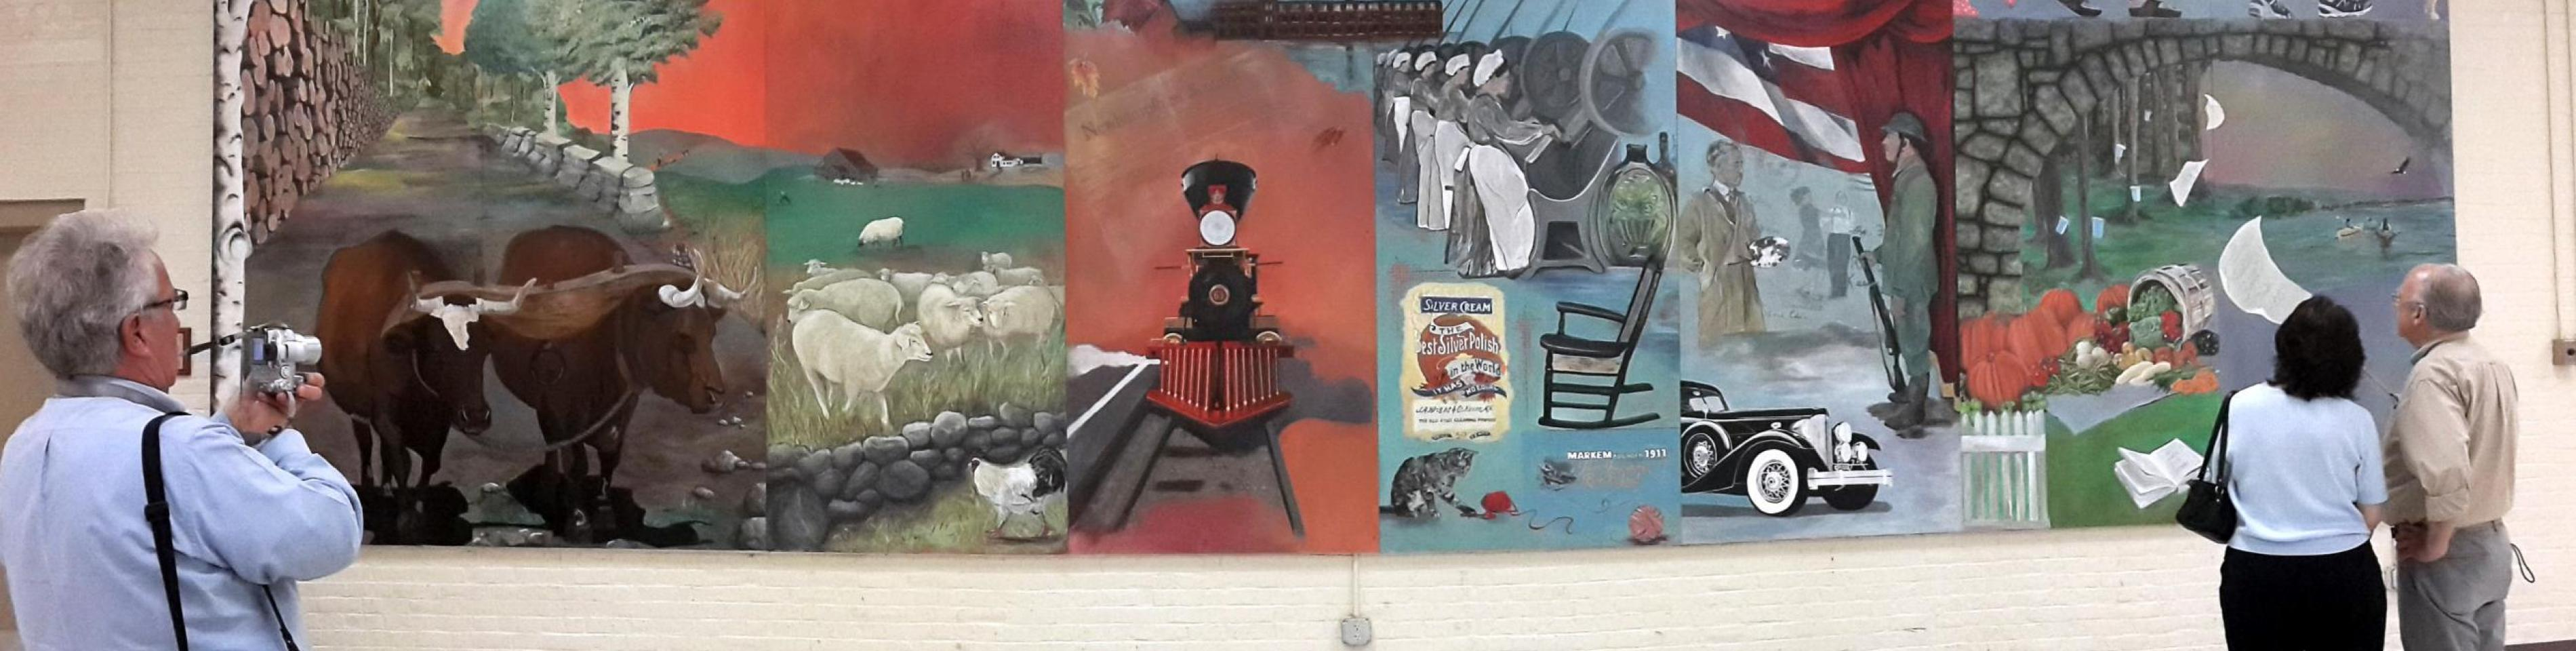 History of Keene Mural at Recreation Center